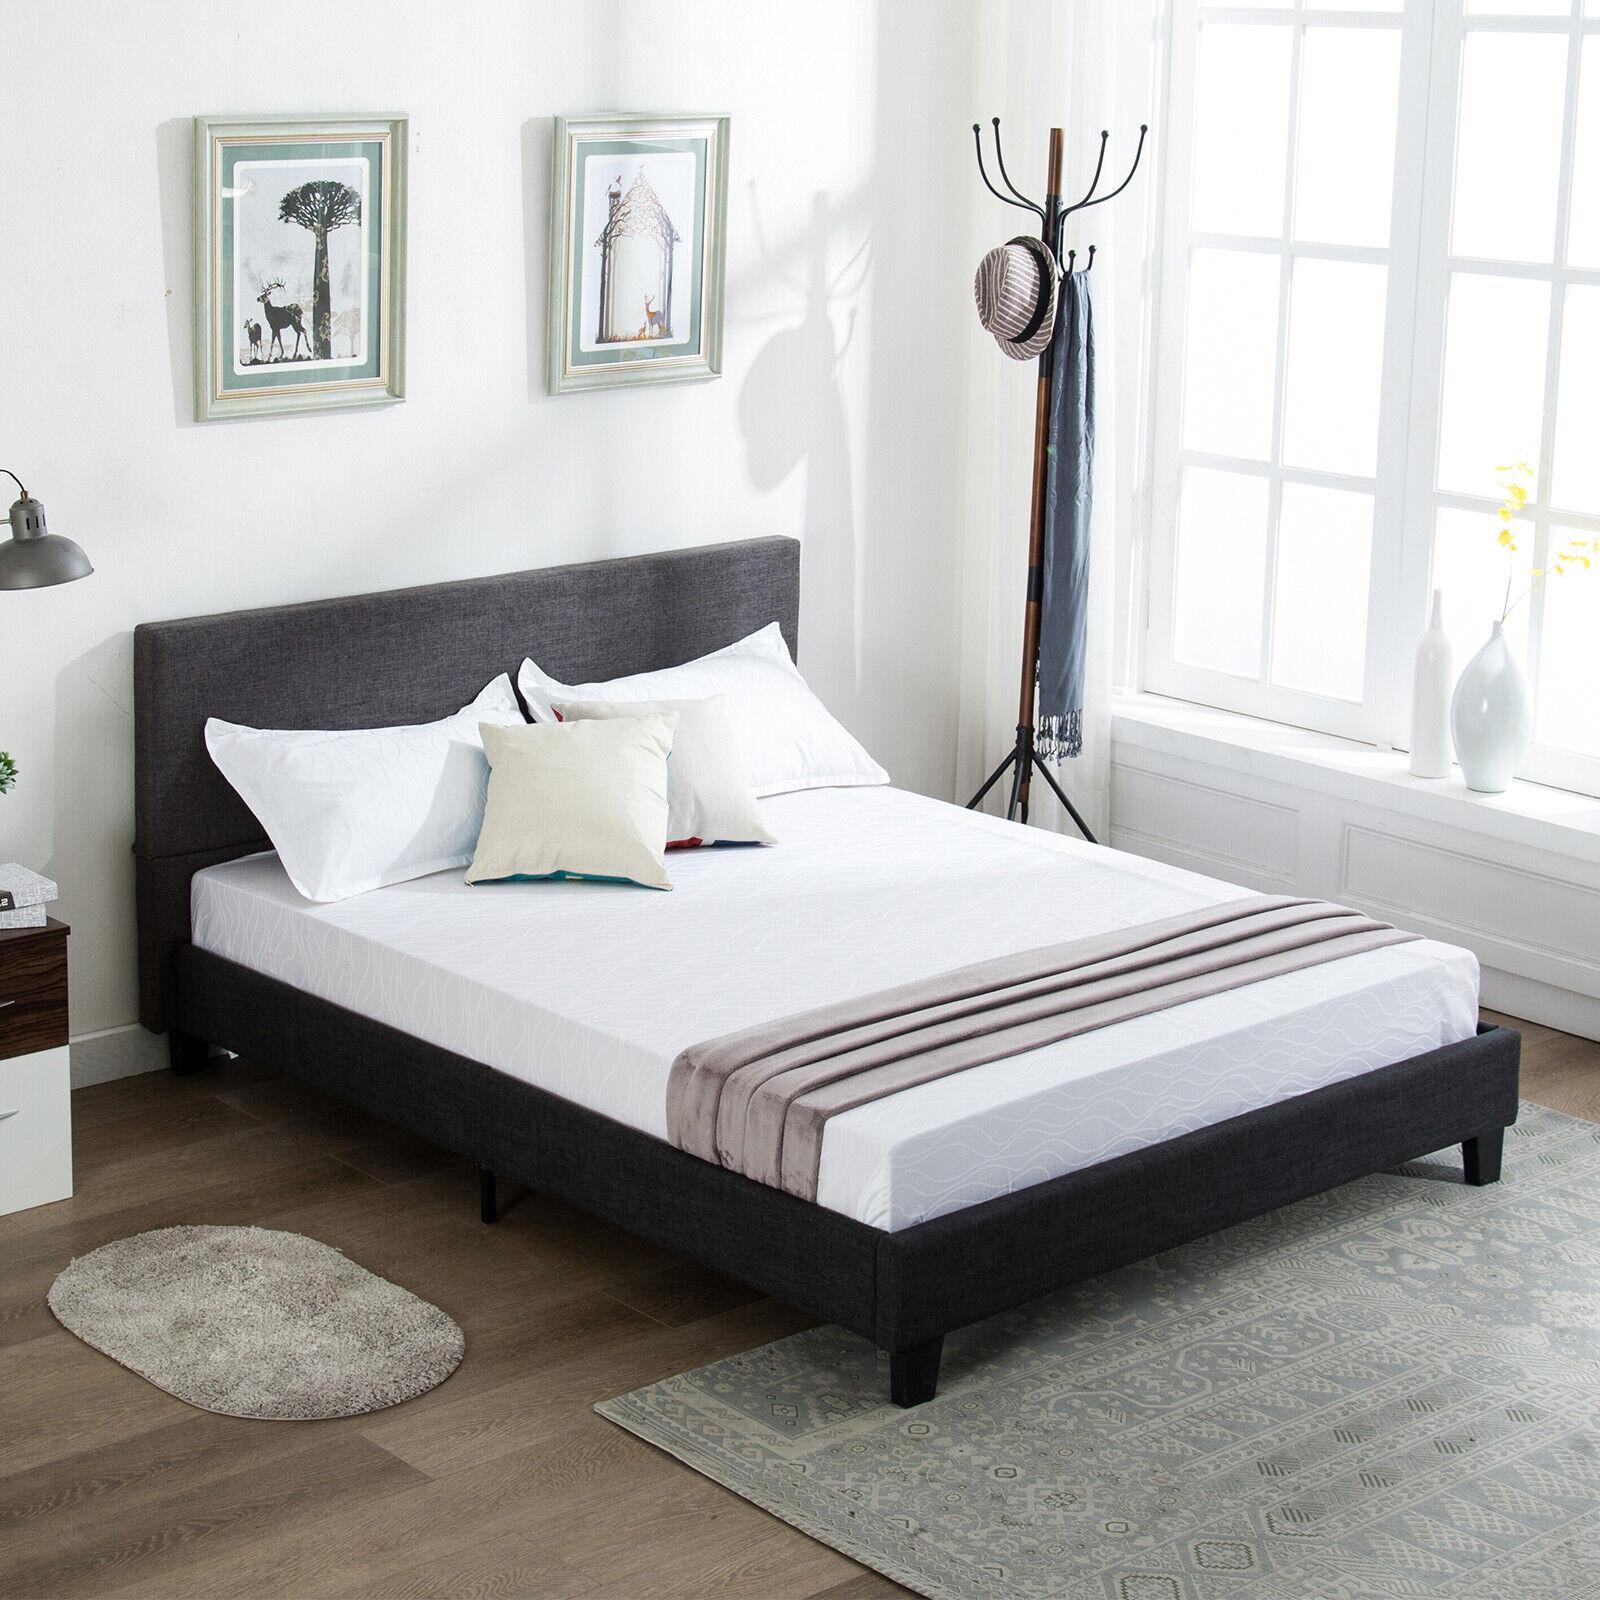 Tuffing Loft Bed Frame Dark Gray For Sale Online Ebay